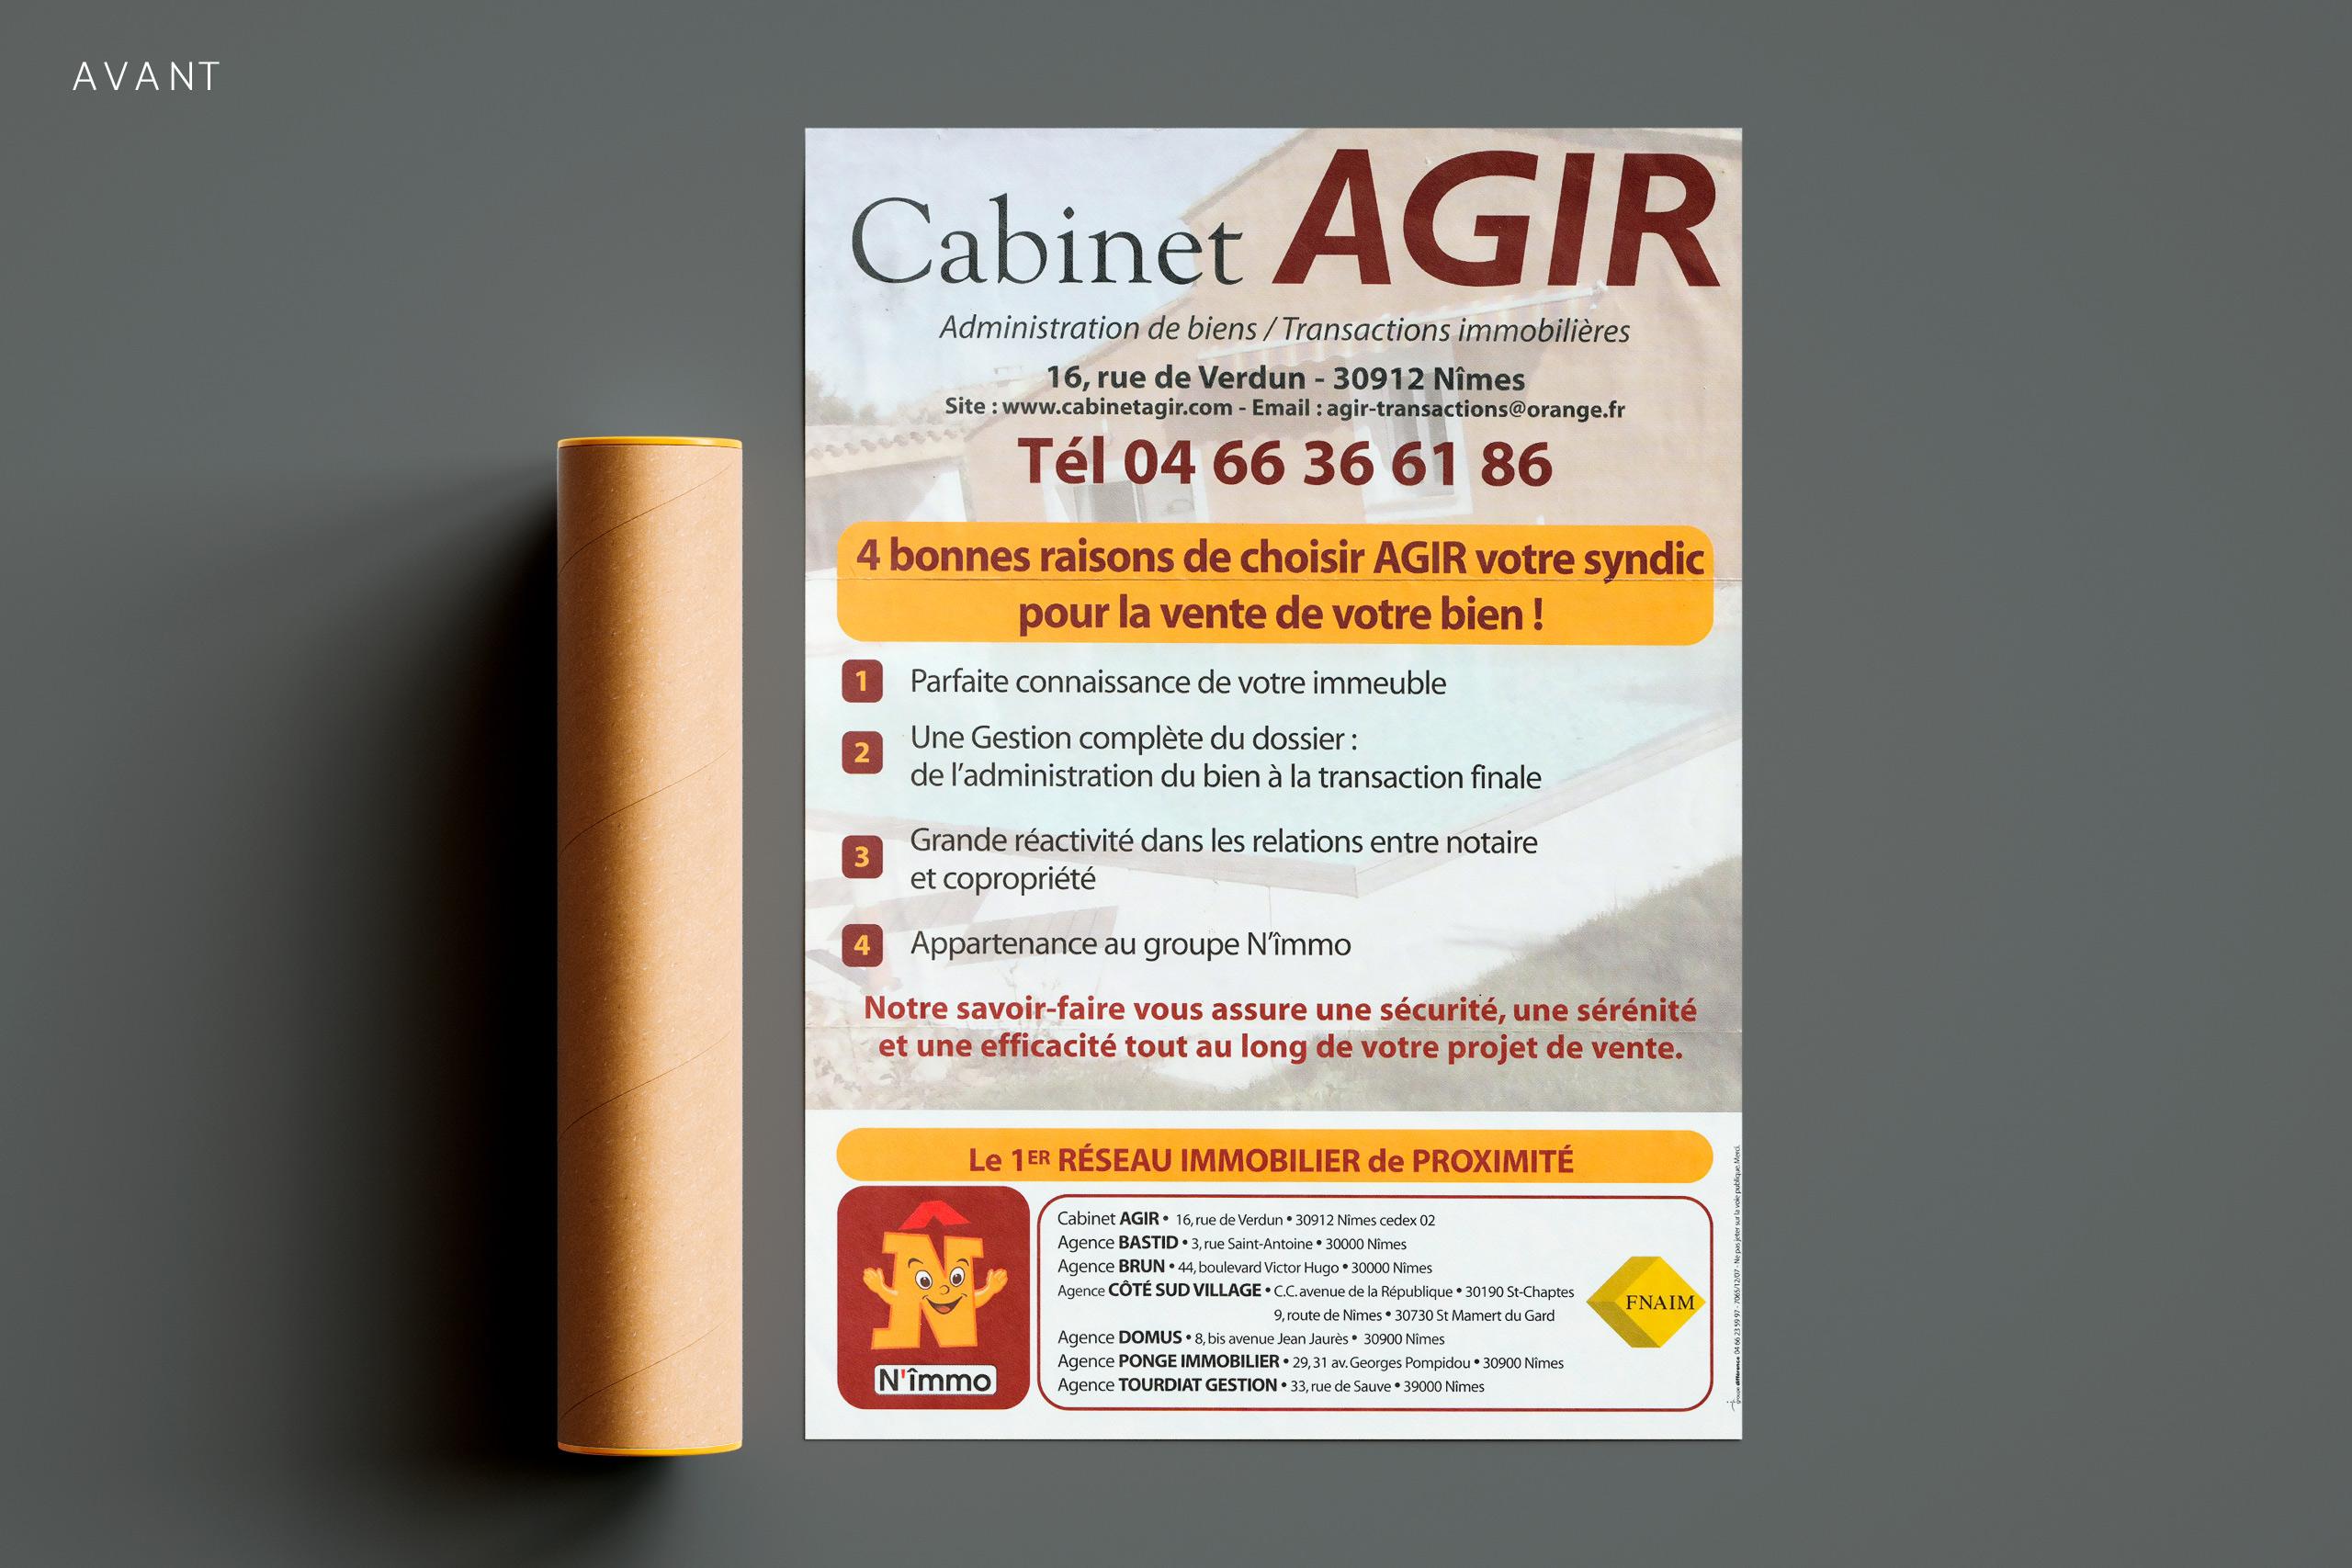 Agir-avant-Agence-communication-Love-My-Name-